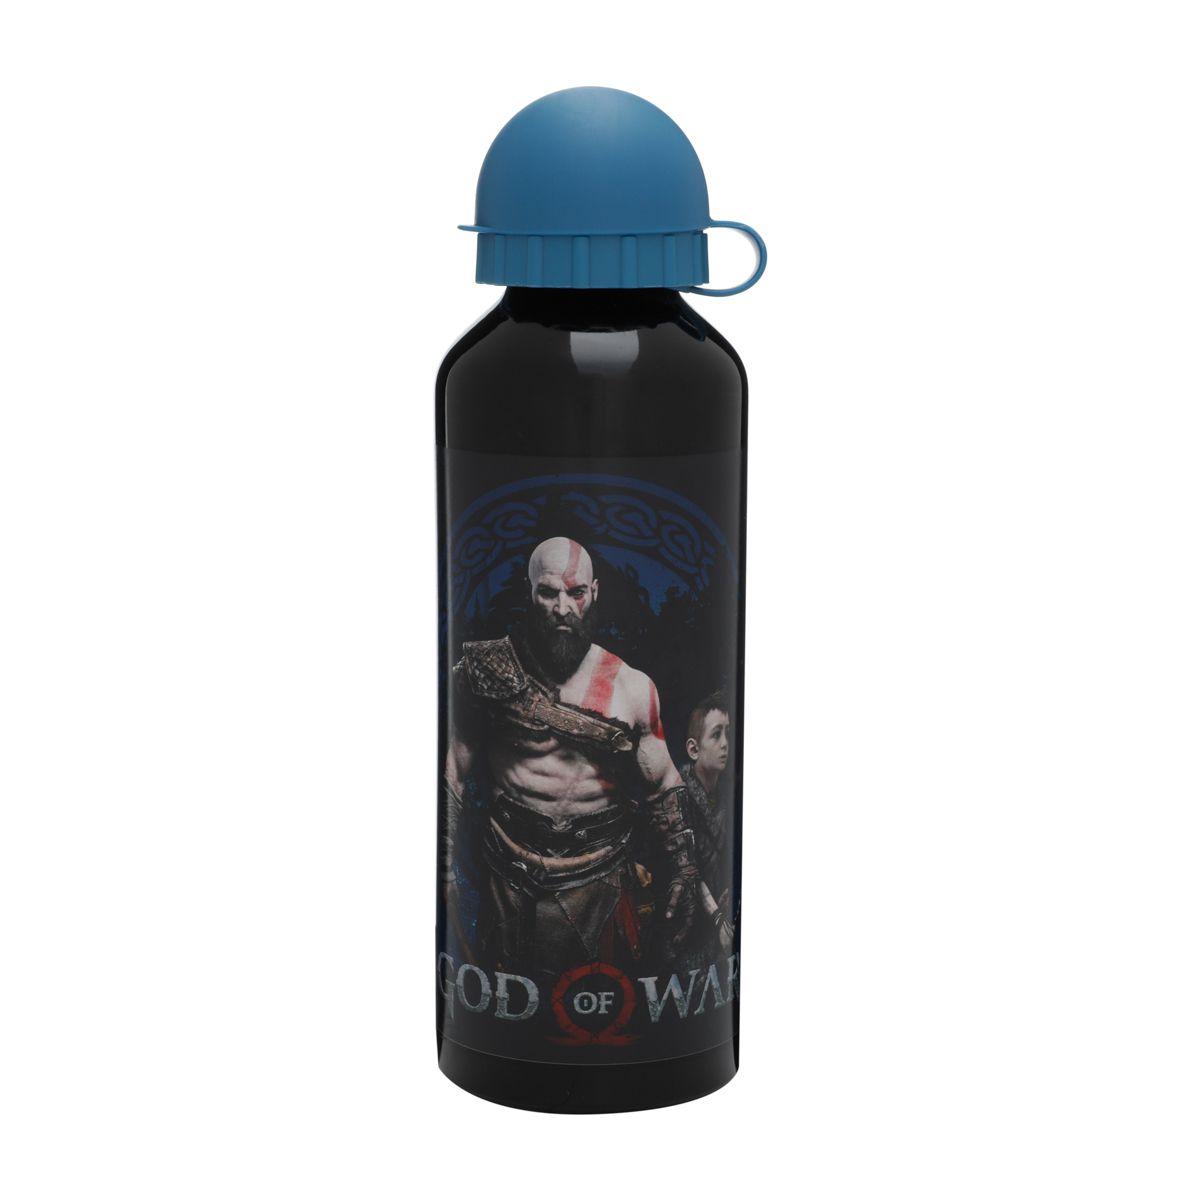 Squeeze Aluminio Kratos God of War Oficial 500ml Black